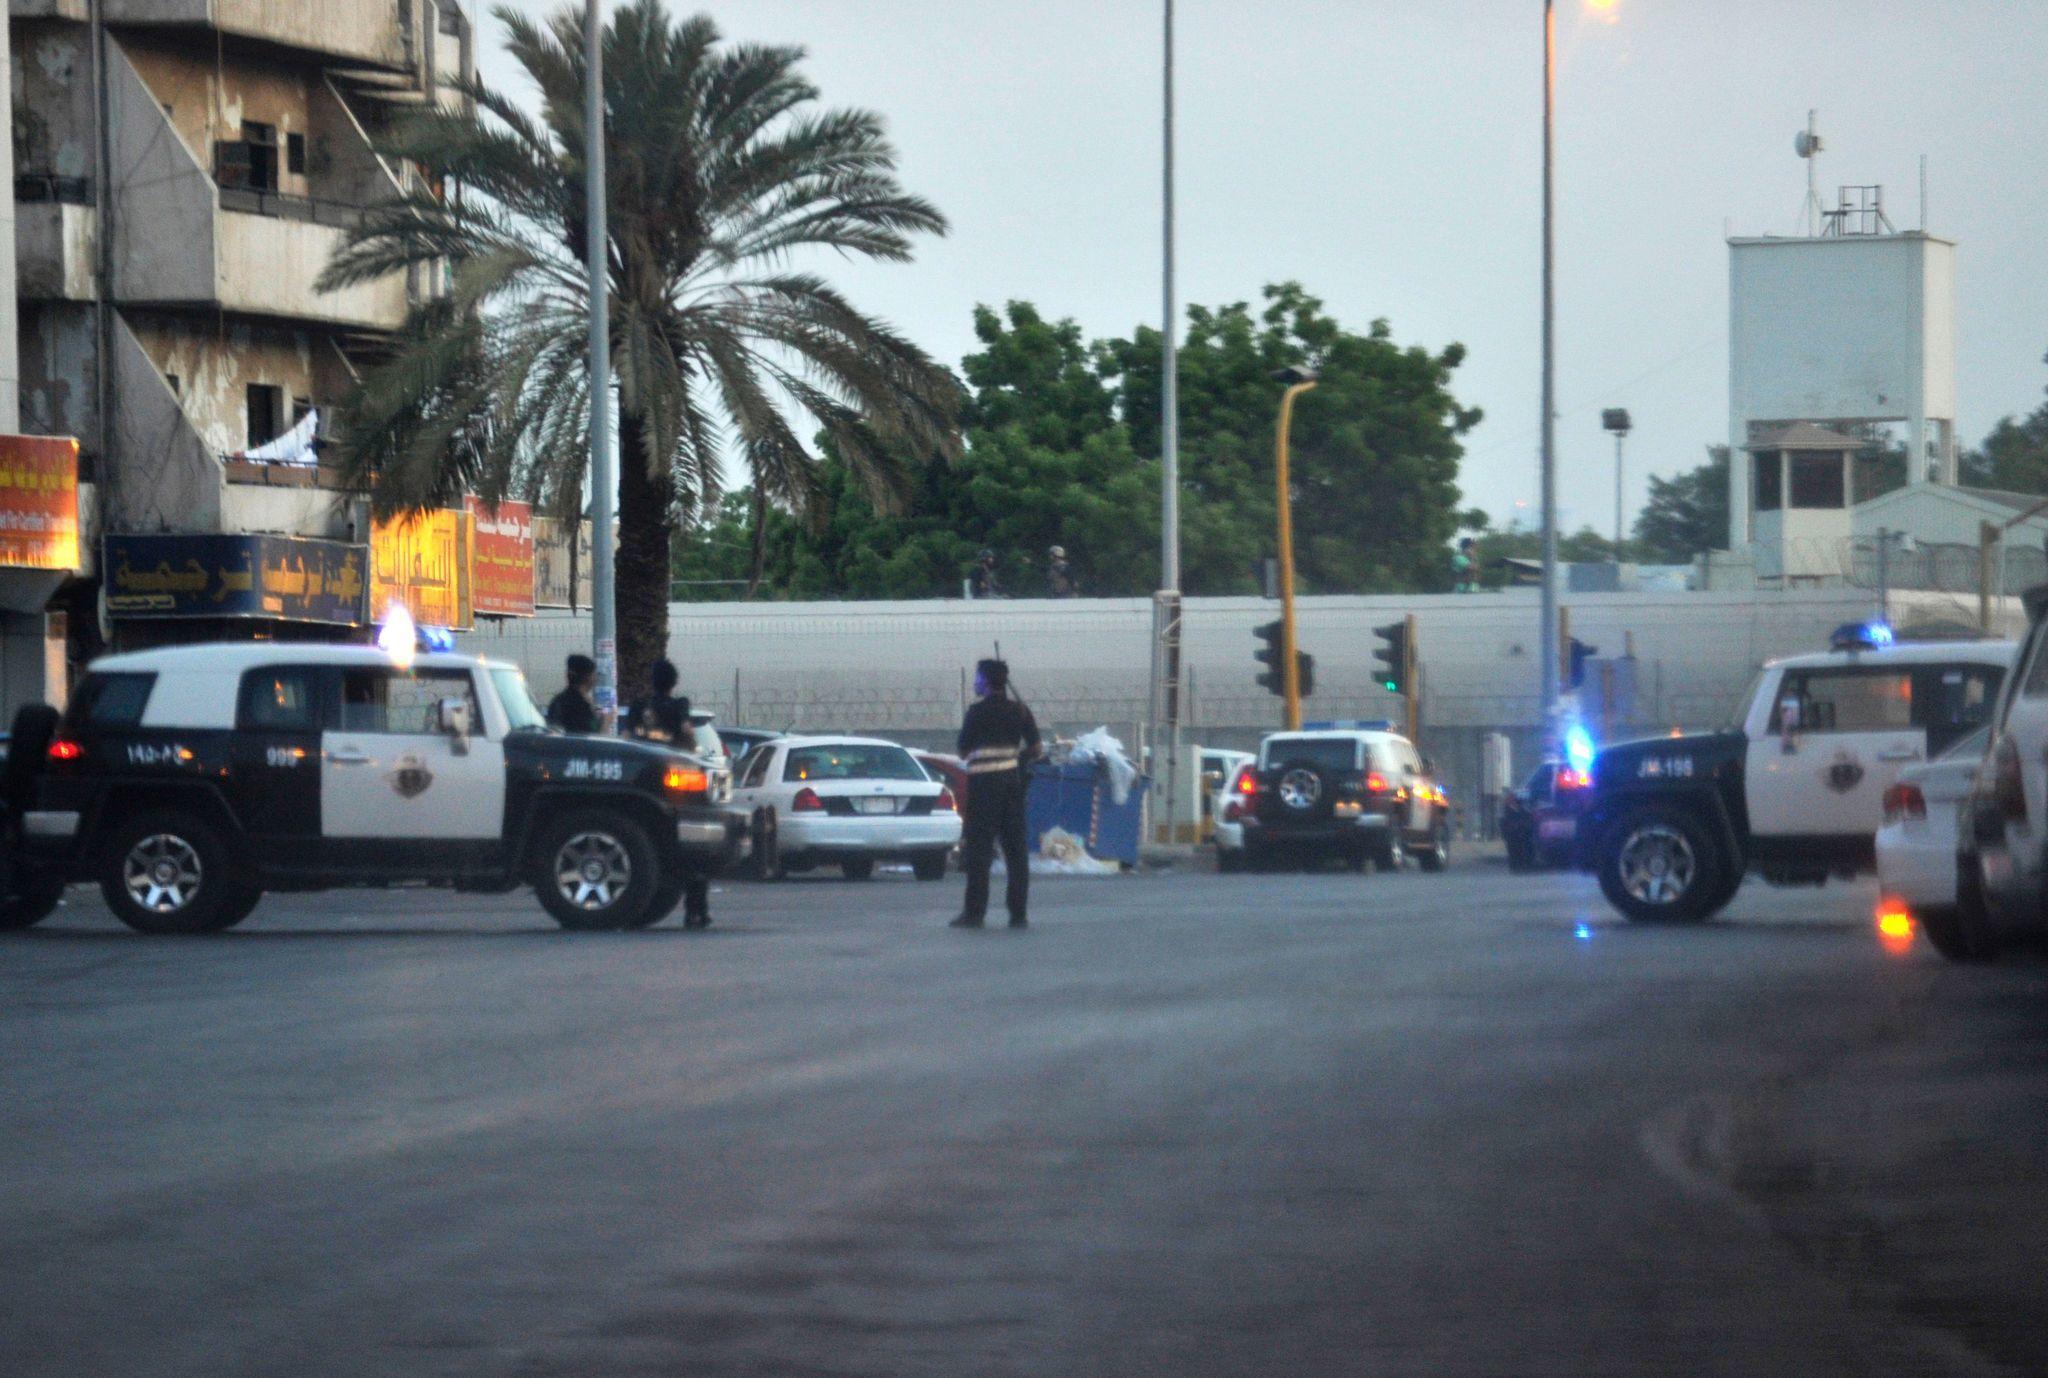 Suicide bomber hits near U.S. Consulate in Saudi Arabia